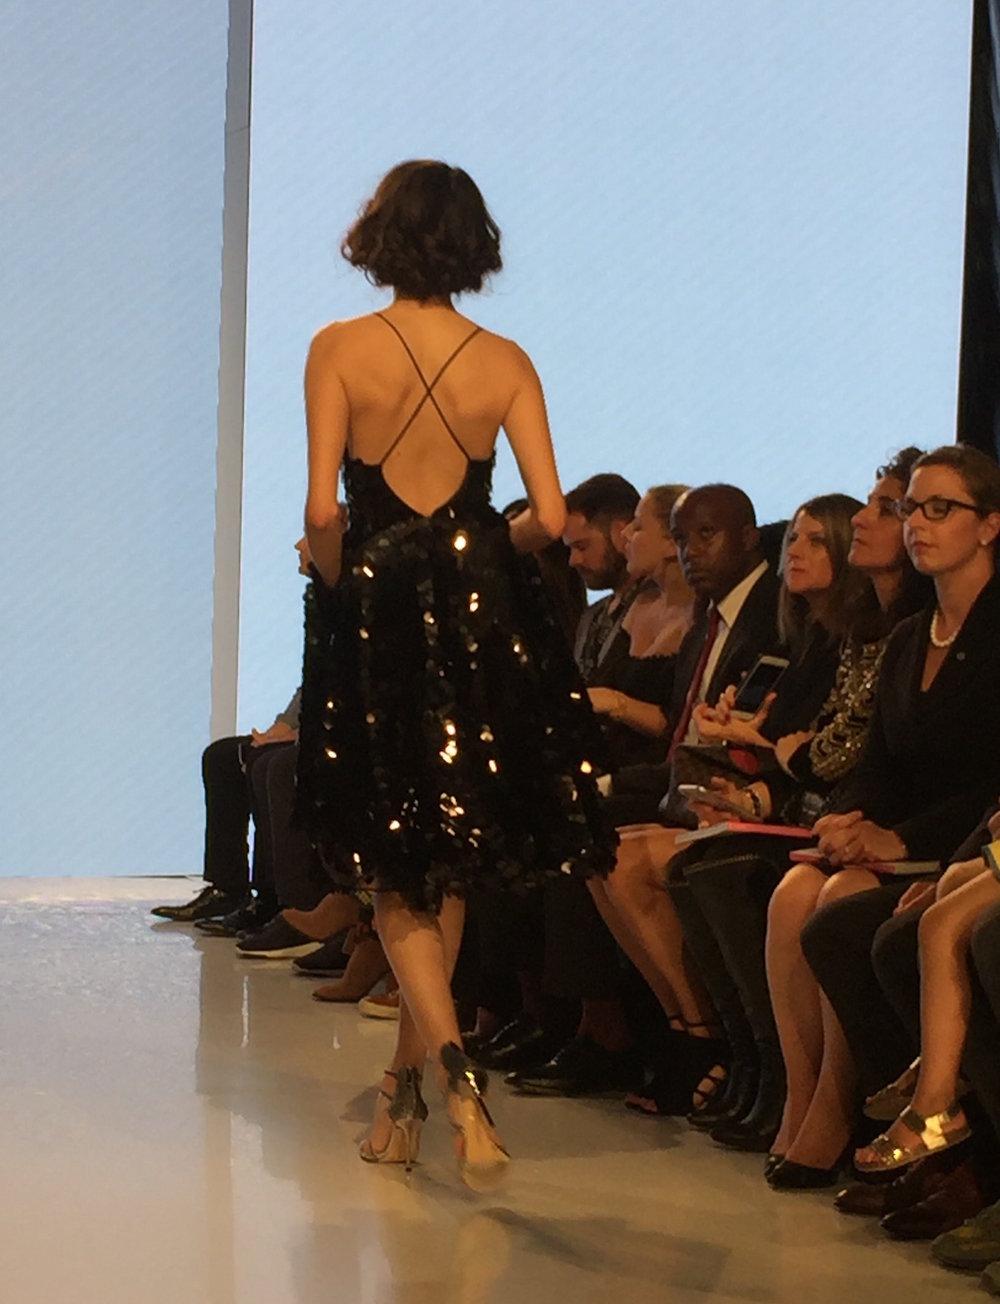 Narces-Toronto-Fashion-Week-TFW-SS18-Pocket-Dress-3.JPG